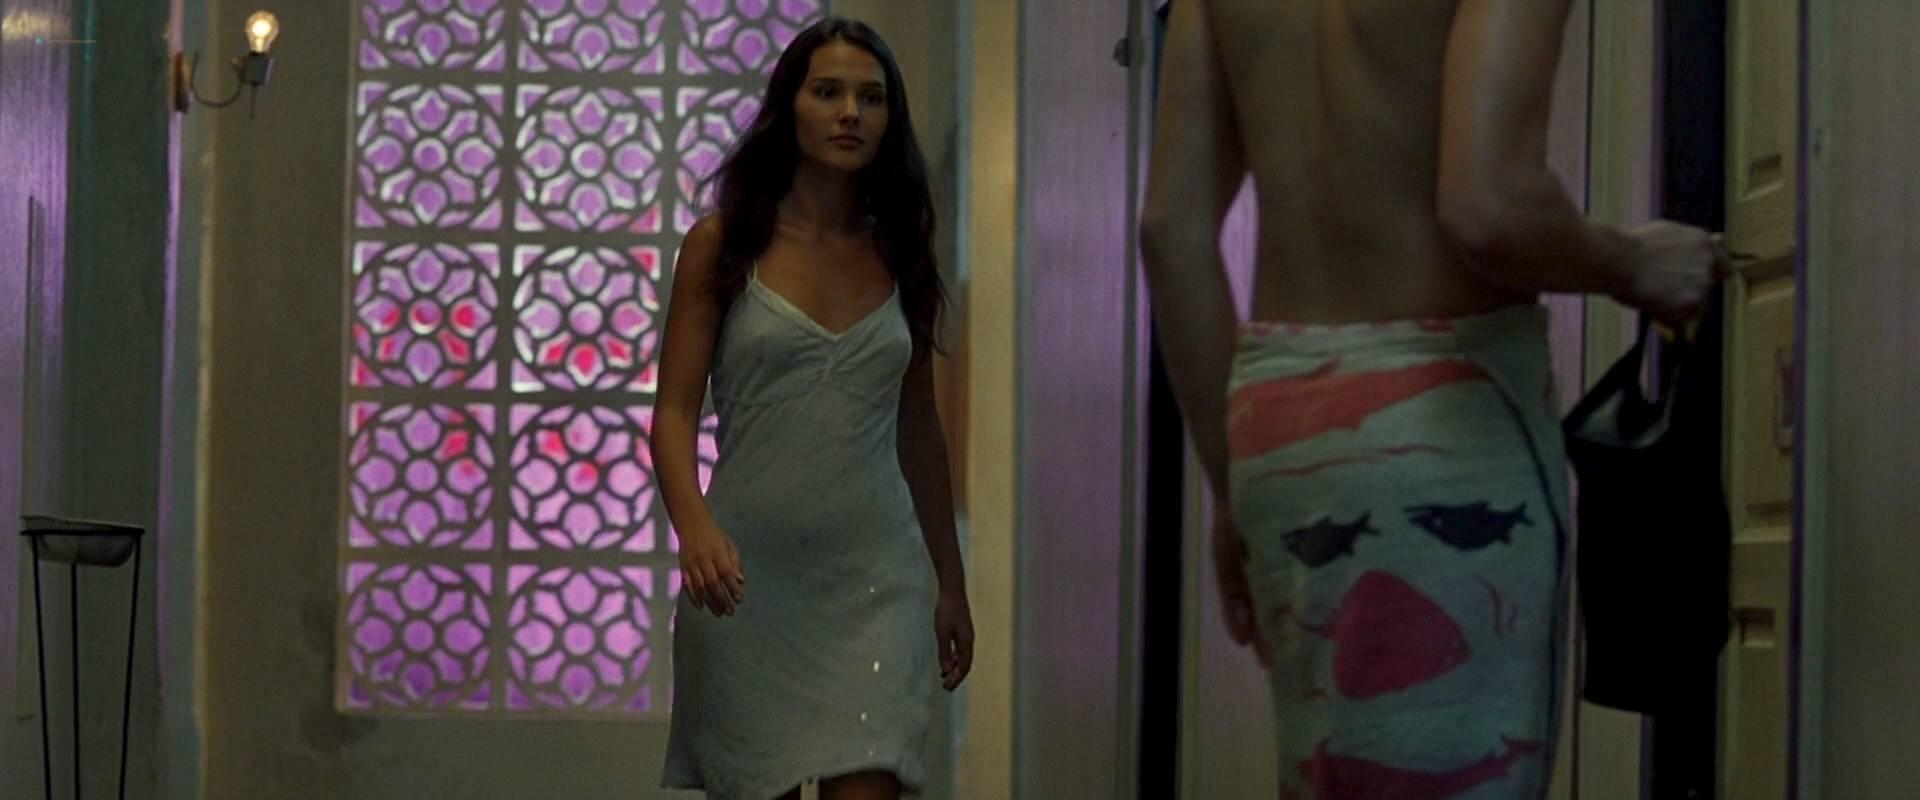 Virginie Ledoyen nude topless Tilda Swinton hot sex - The Beach (2000) HD 1080p BluRay (18)